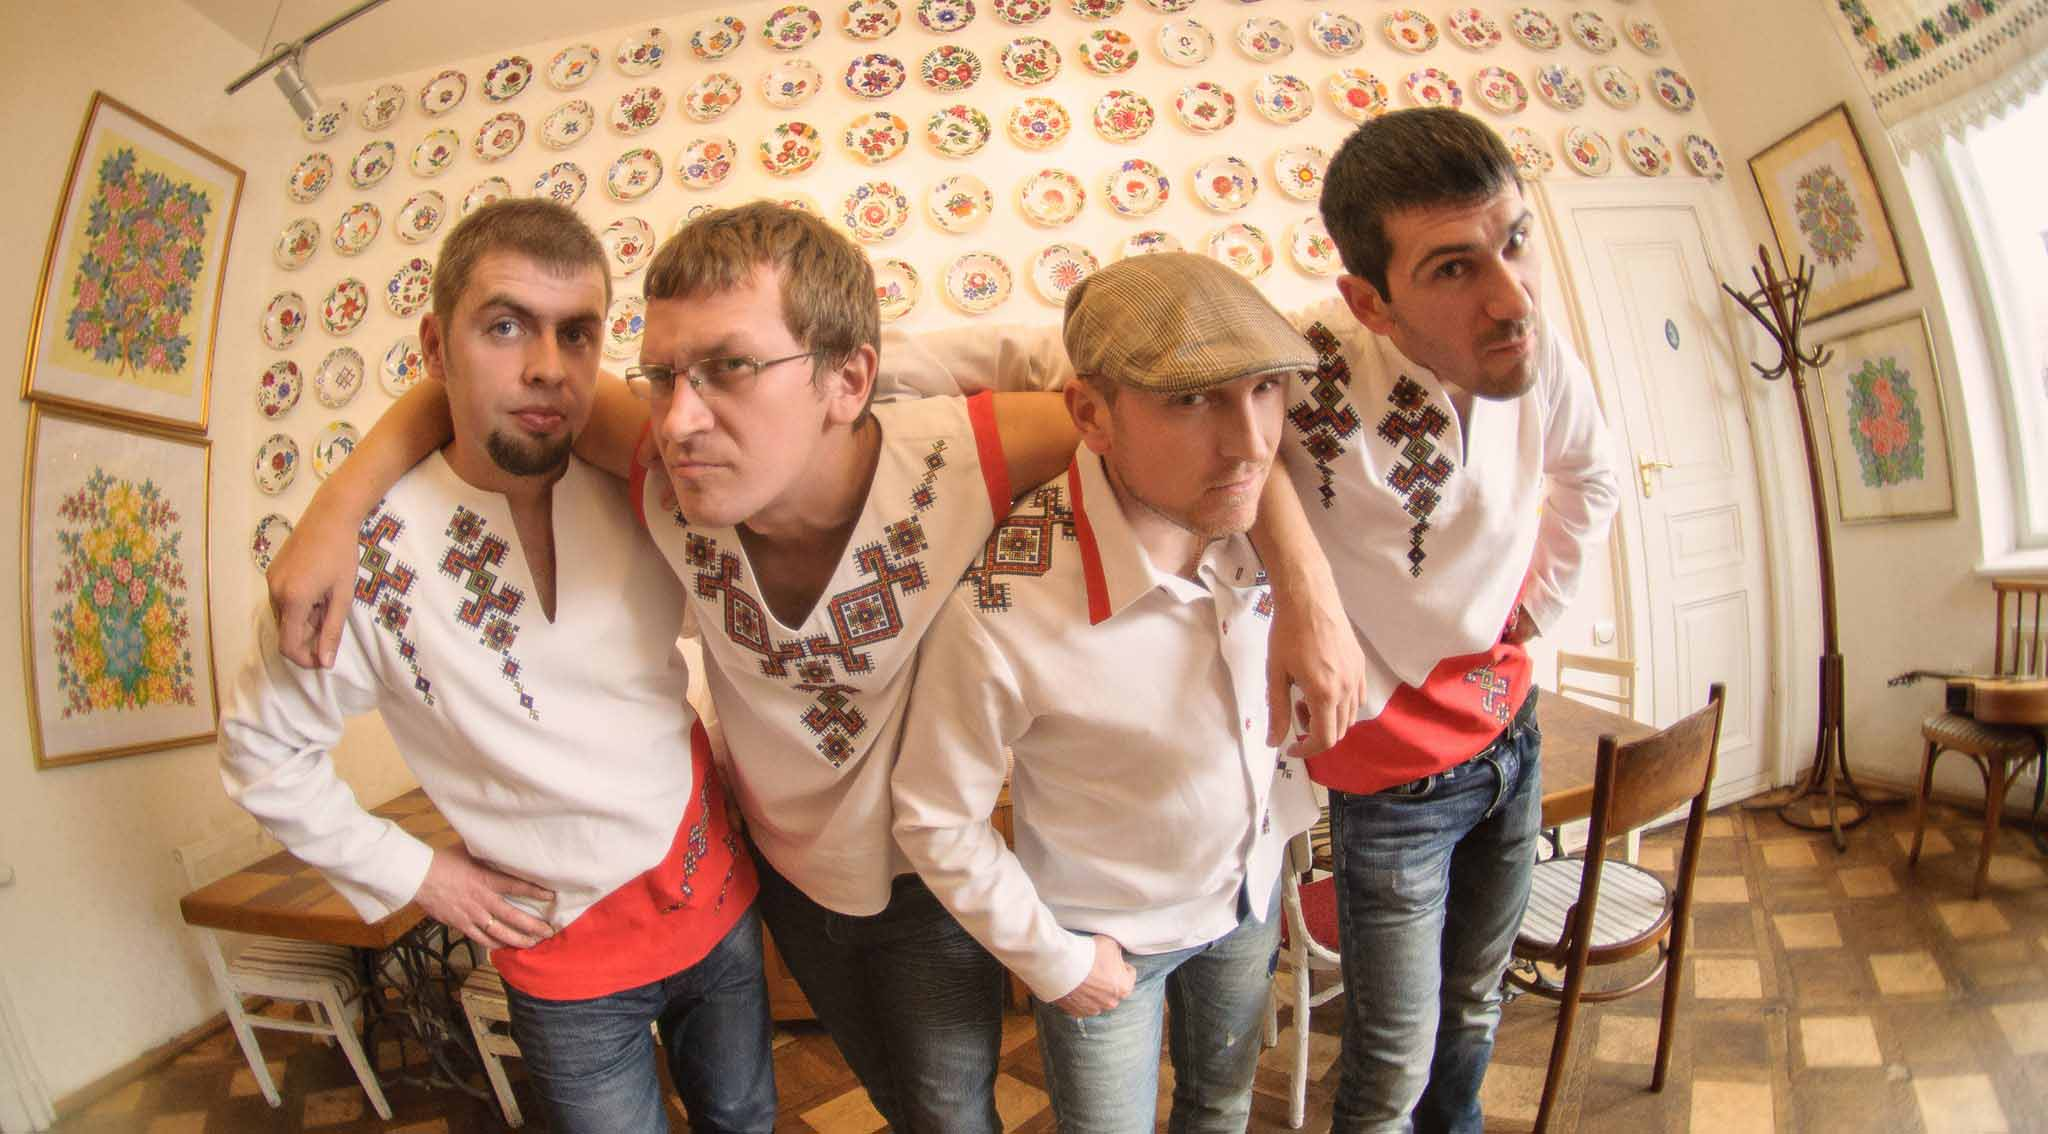 tsvitkulbaby2 ФОТОГАЛЕРЕЯ — UA MUSIC | Енциклопедія української музики